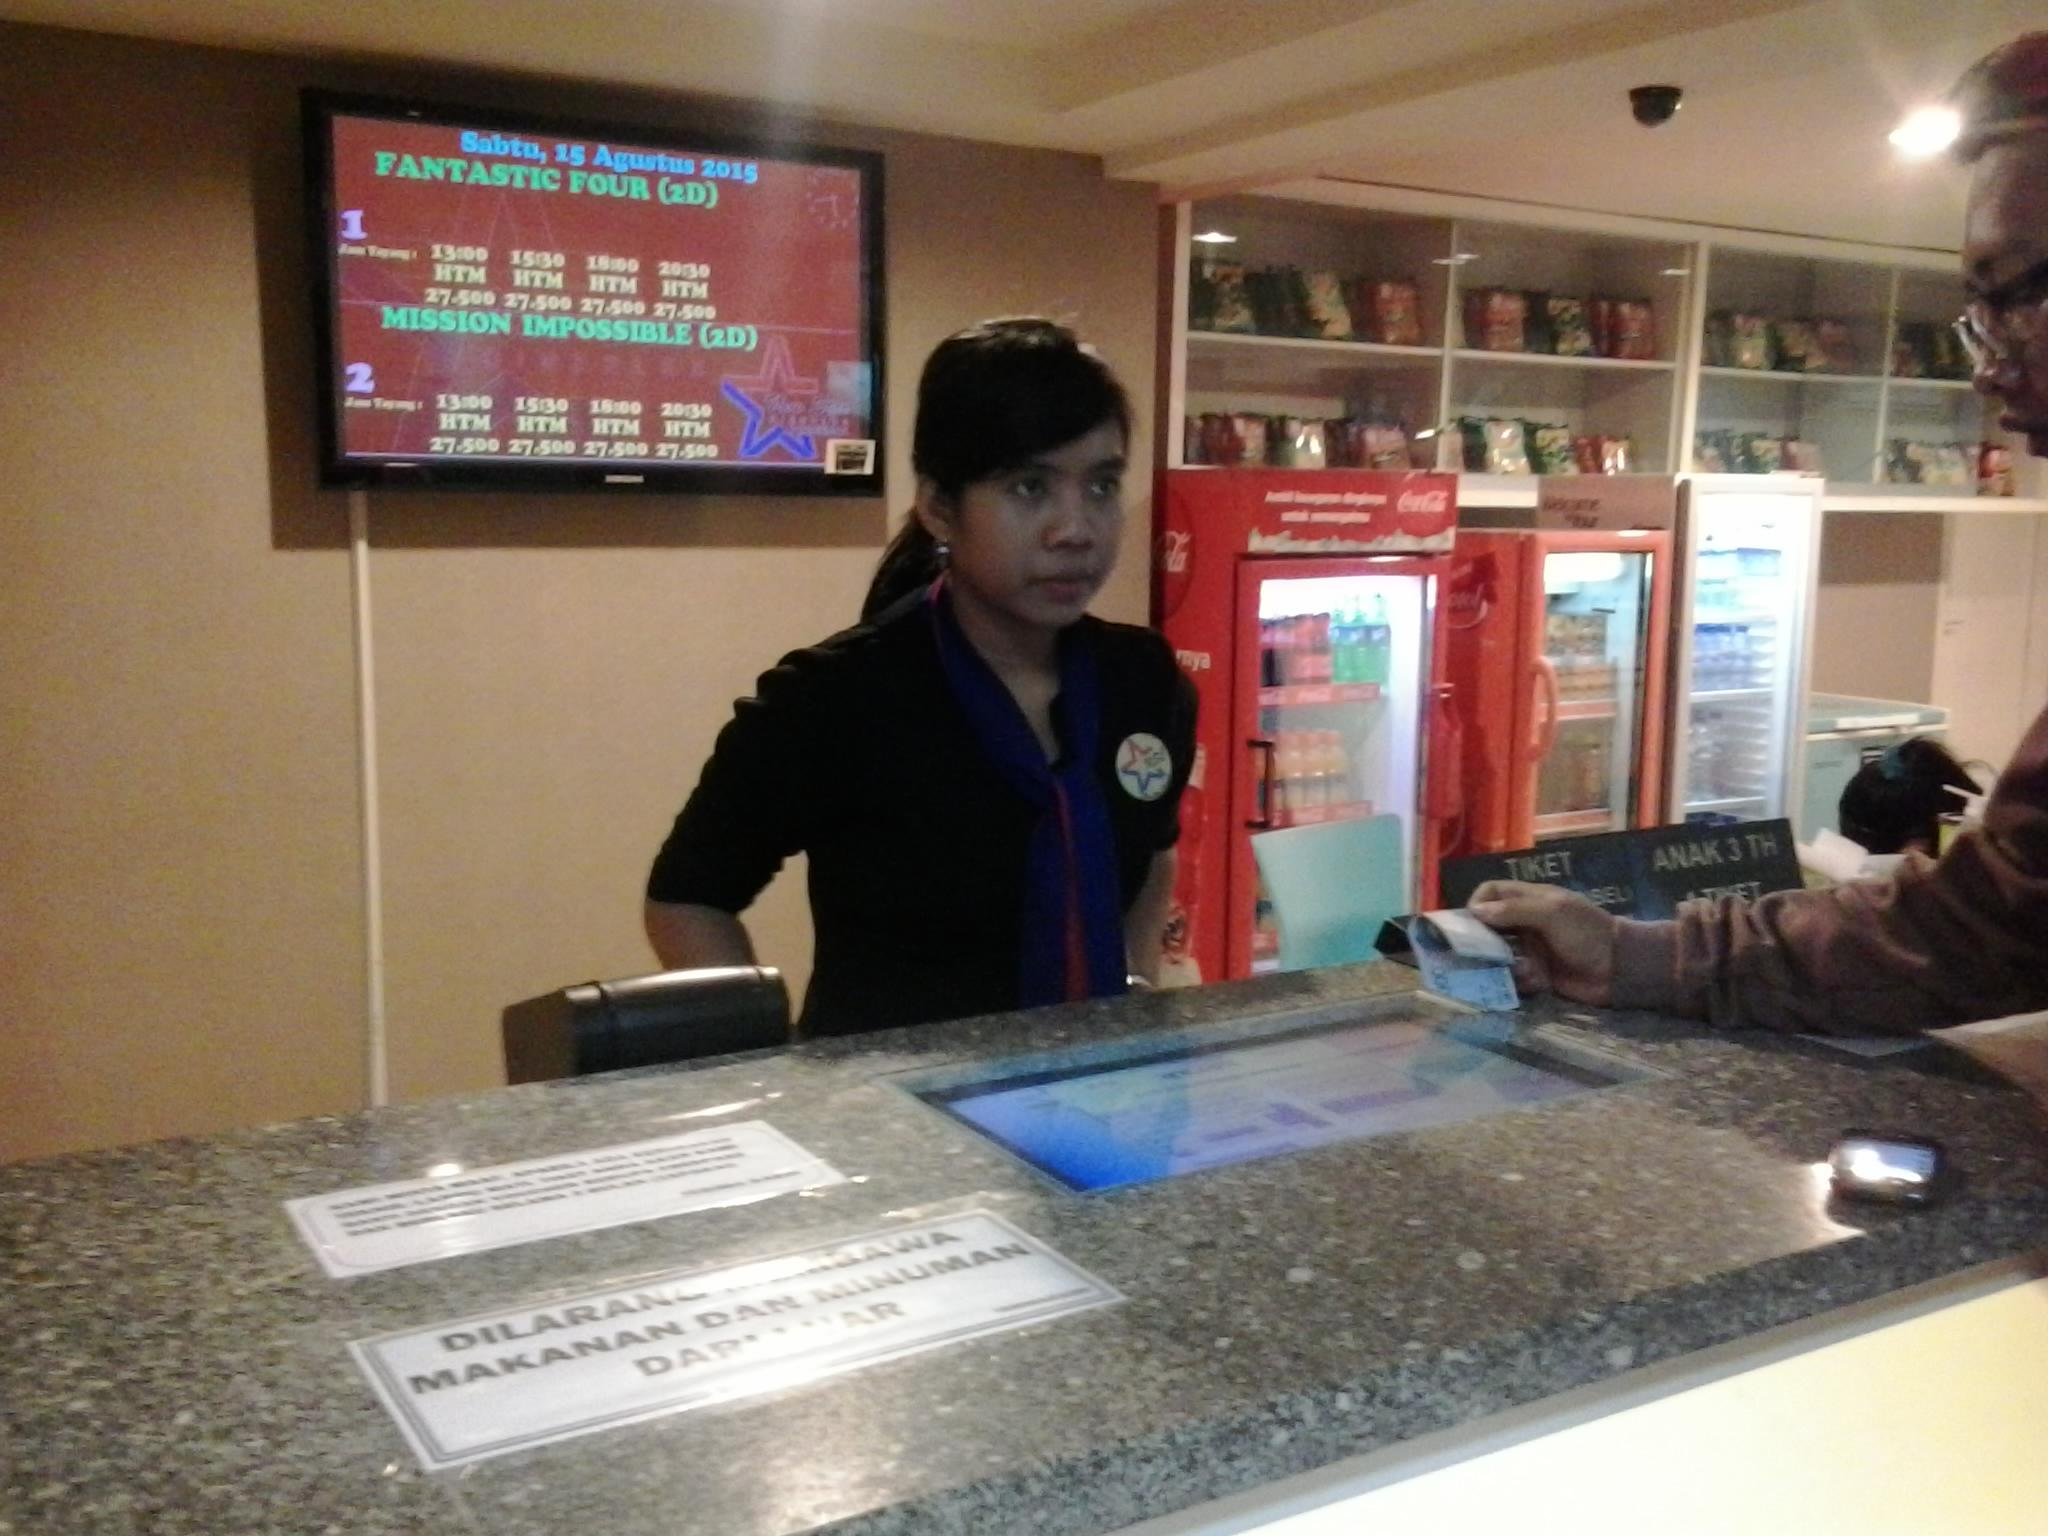 Pasuruan Cineplex Harga Tiketnya Bikin Orang Emosi Oleh Darwin Arya